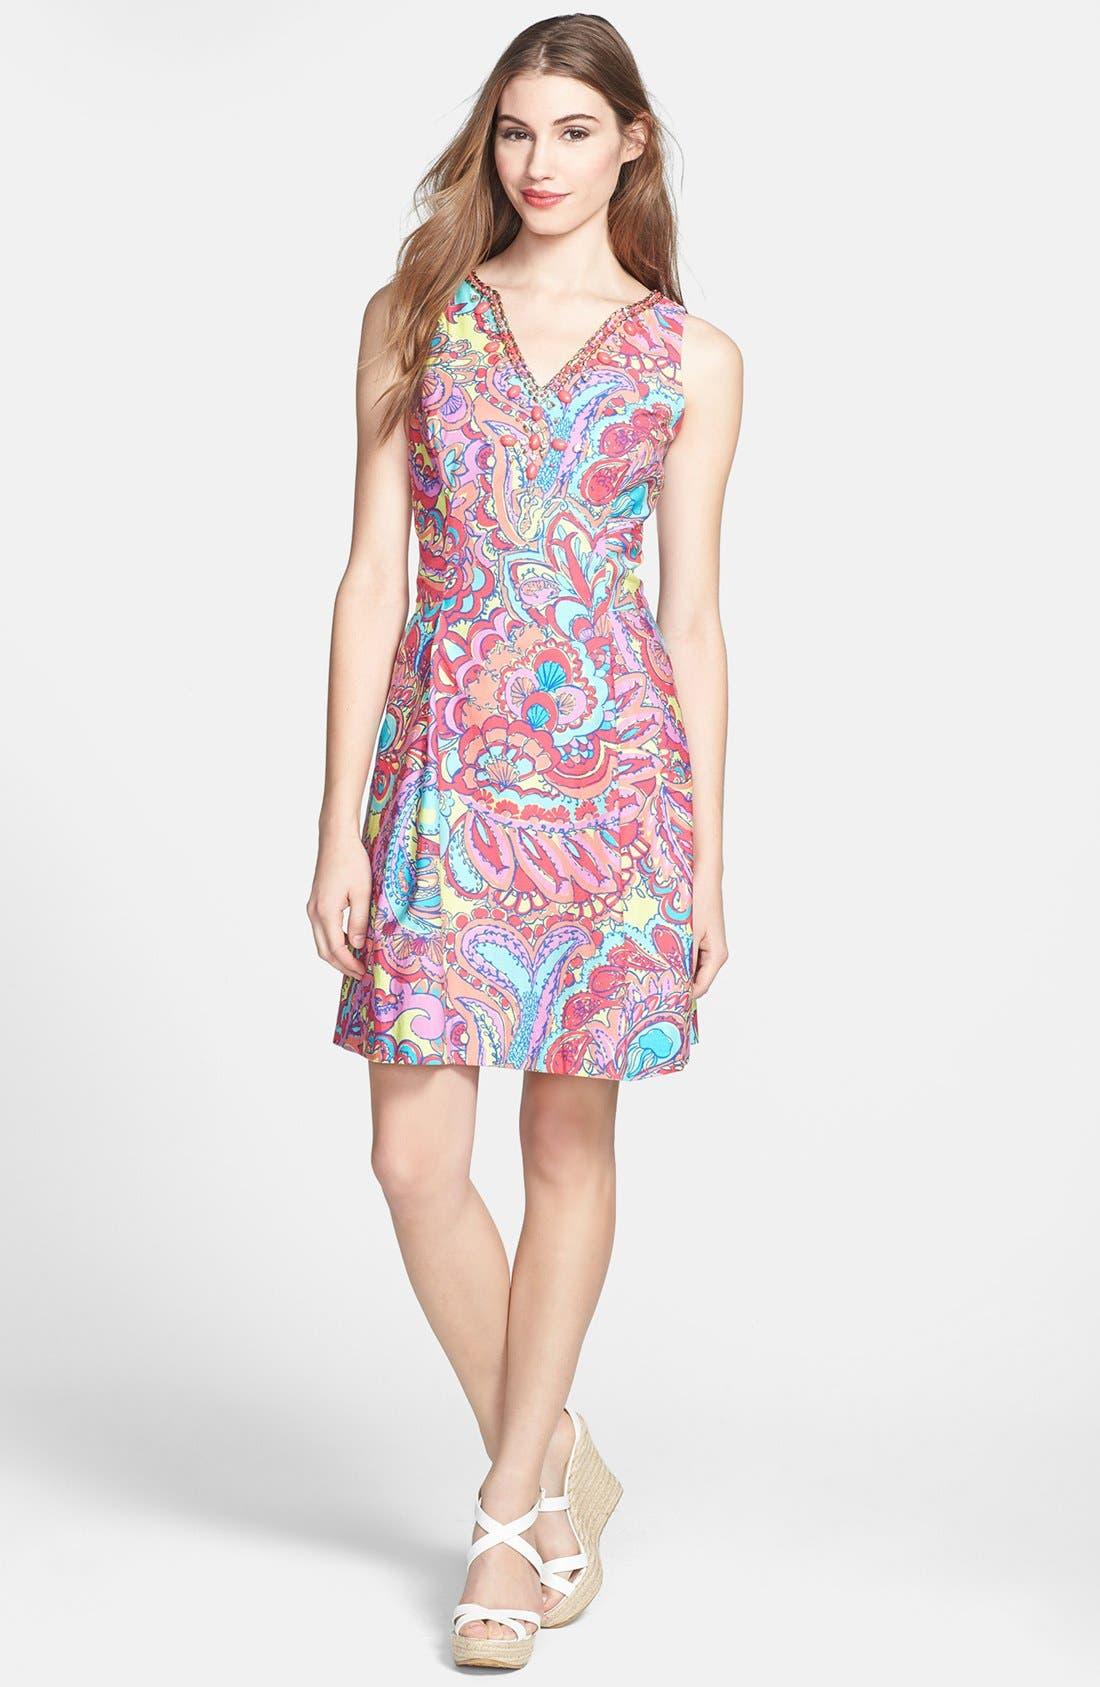 Main Image - Lilly Pulitzer® 'Lloyd' Print Shantung Fit & Flare Dress